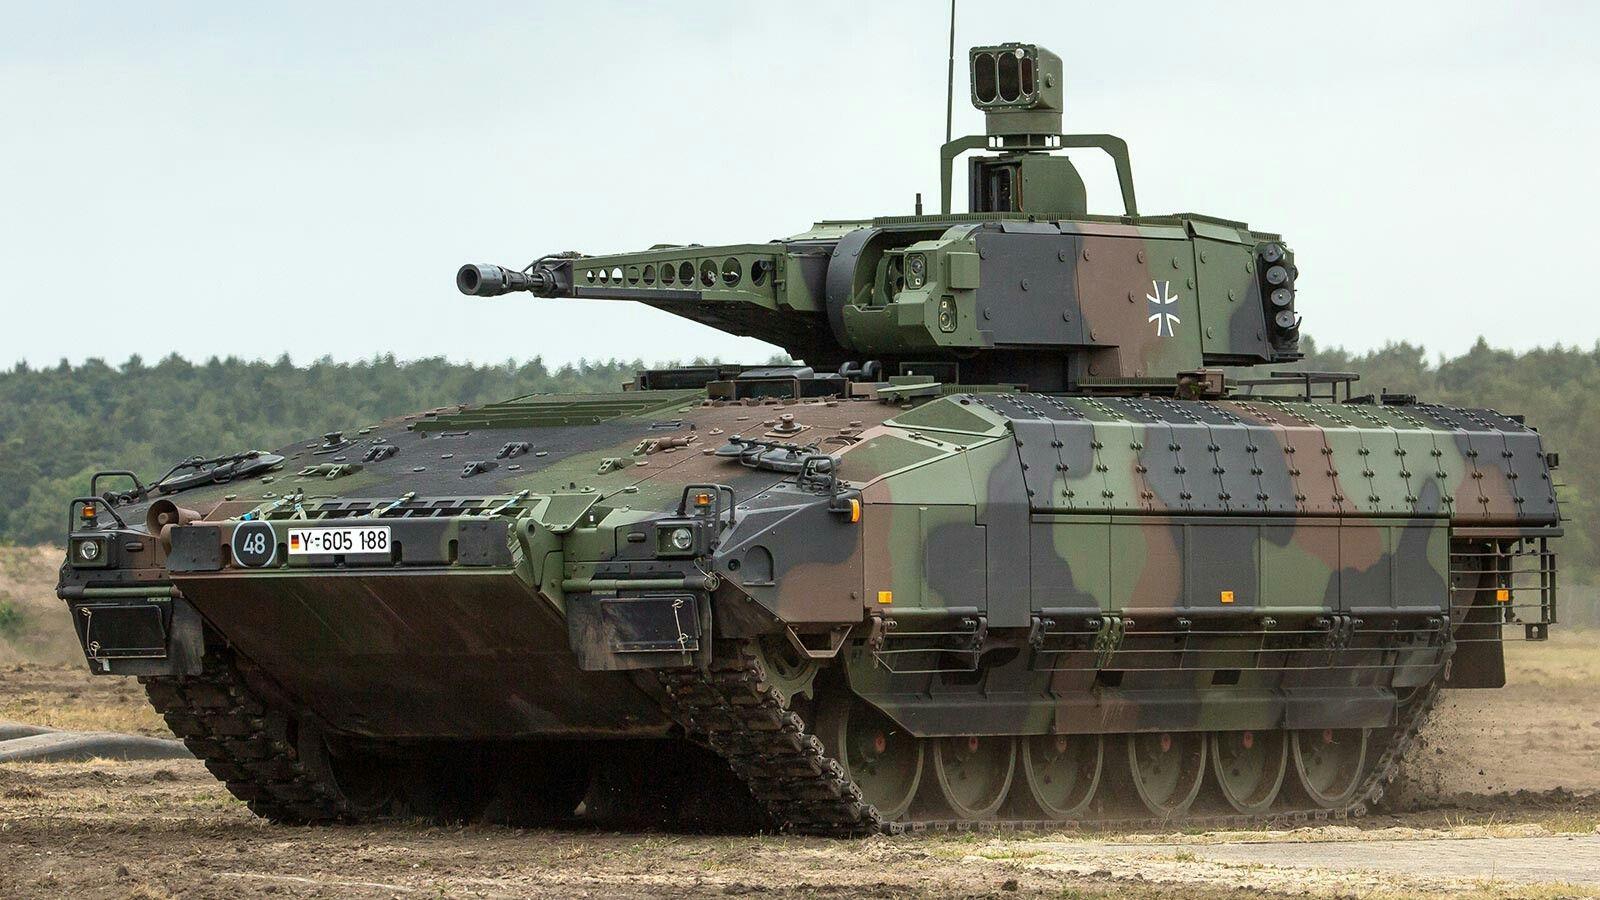 Kmw Rls Spz Puma Ifv Schutzenpanzer With Rwm 30mm Mk 30 2